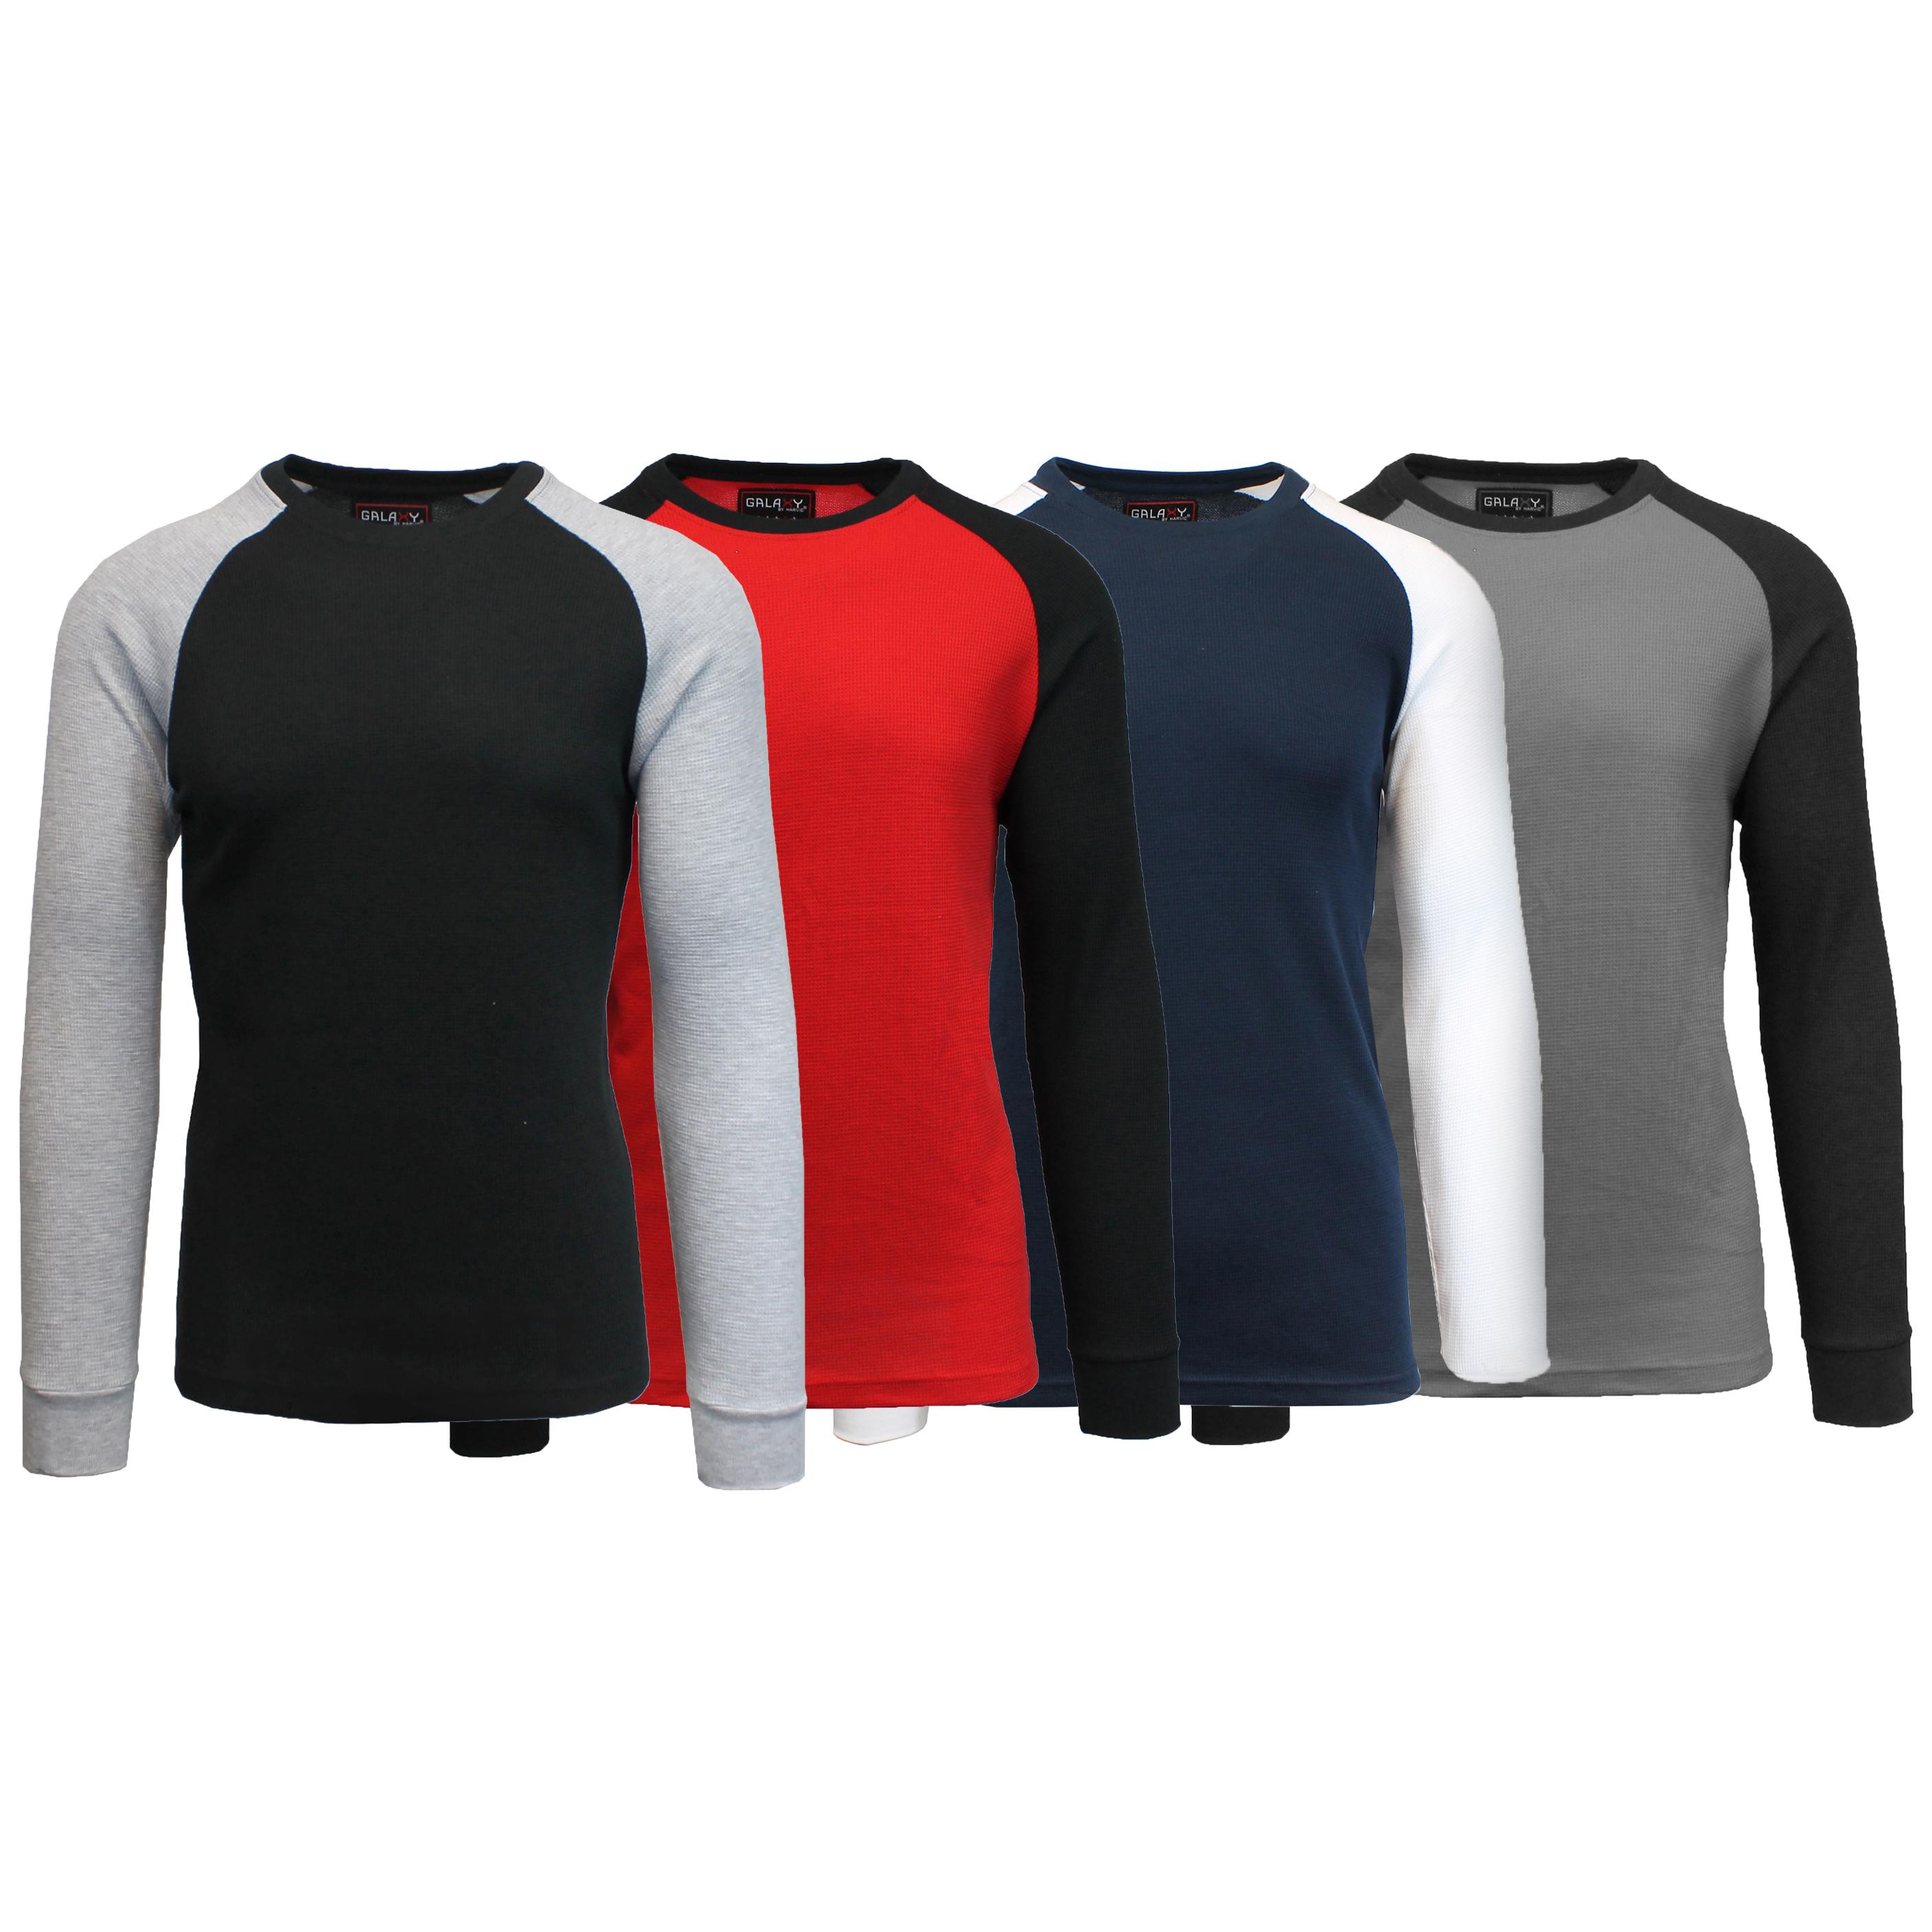 748d8a2c94aa 4-Pack Men s Galaxy by Harvic Waffle Knit Thermal Shirts - Tanga